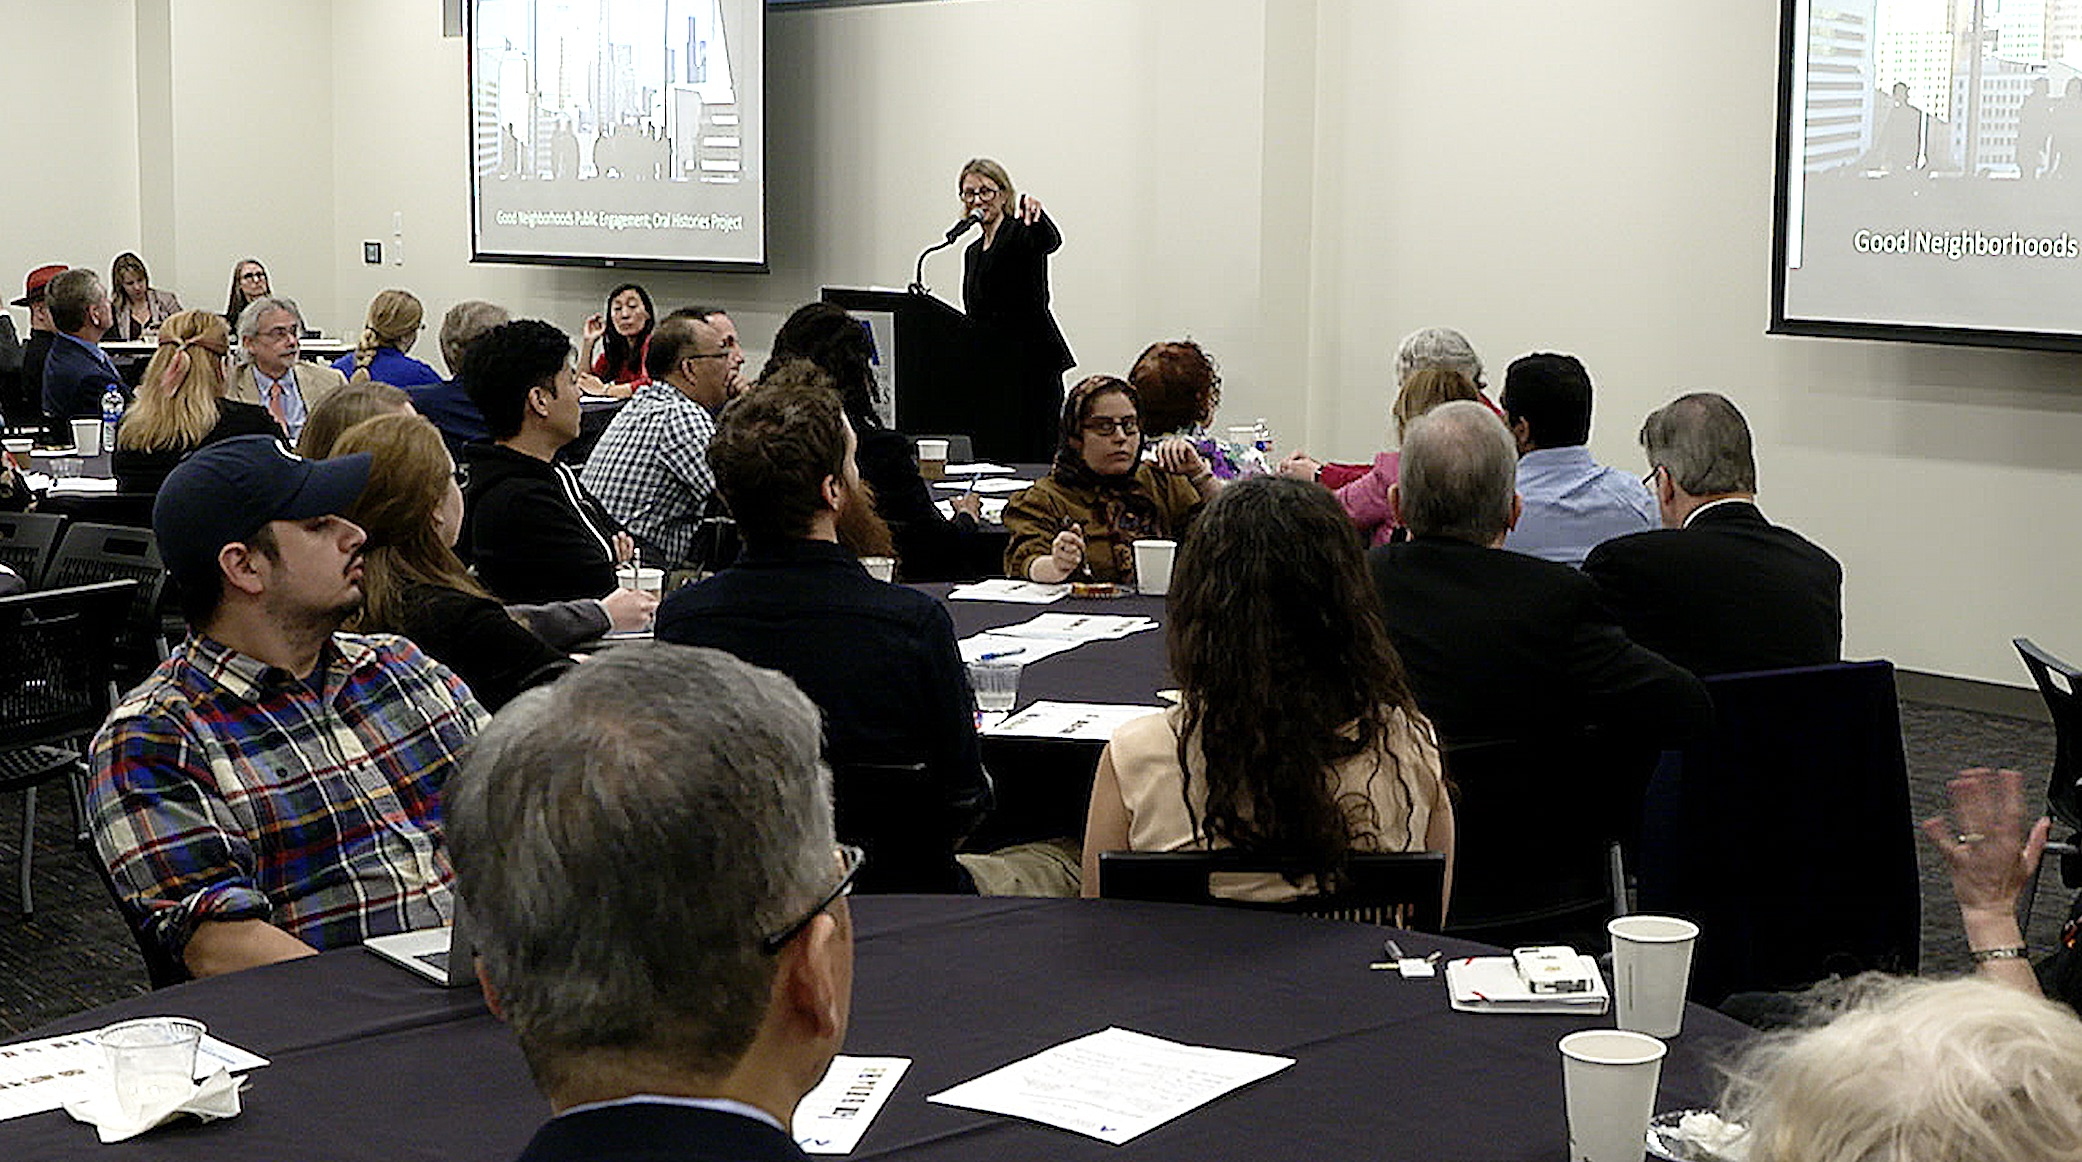 Symposium on sustainable urban communities